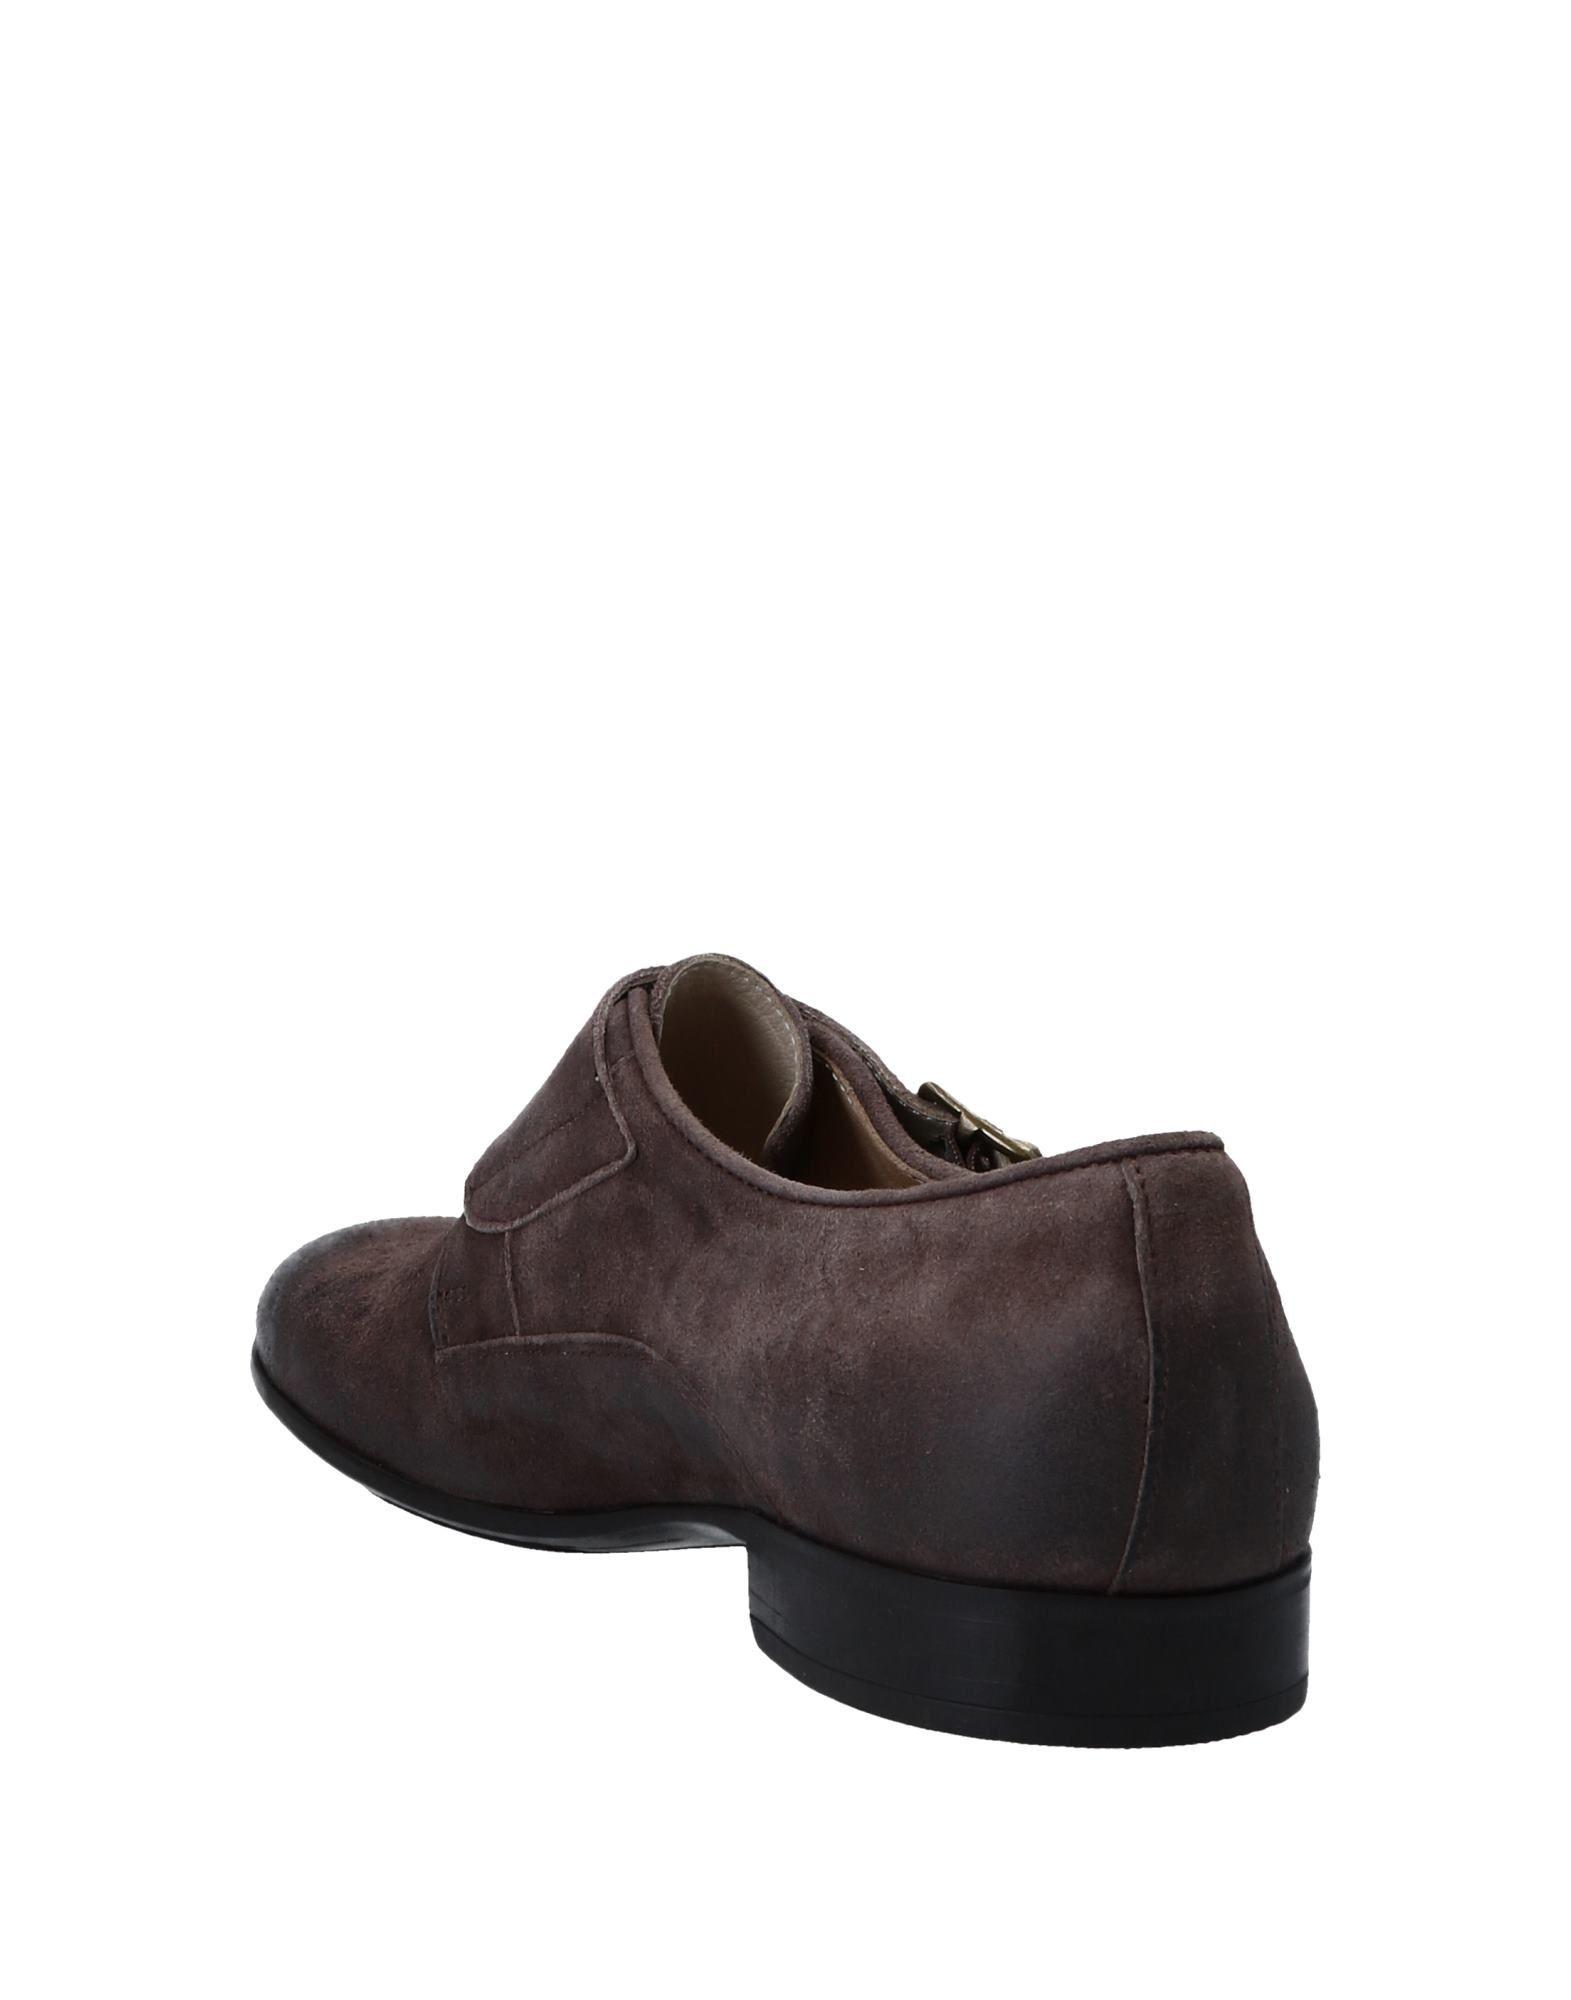 Corvari Gute Mokassins Herren  11553198CJ Gute Corvari Qualität beliebte Schuhe 357b58